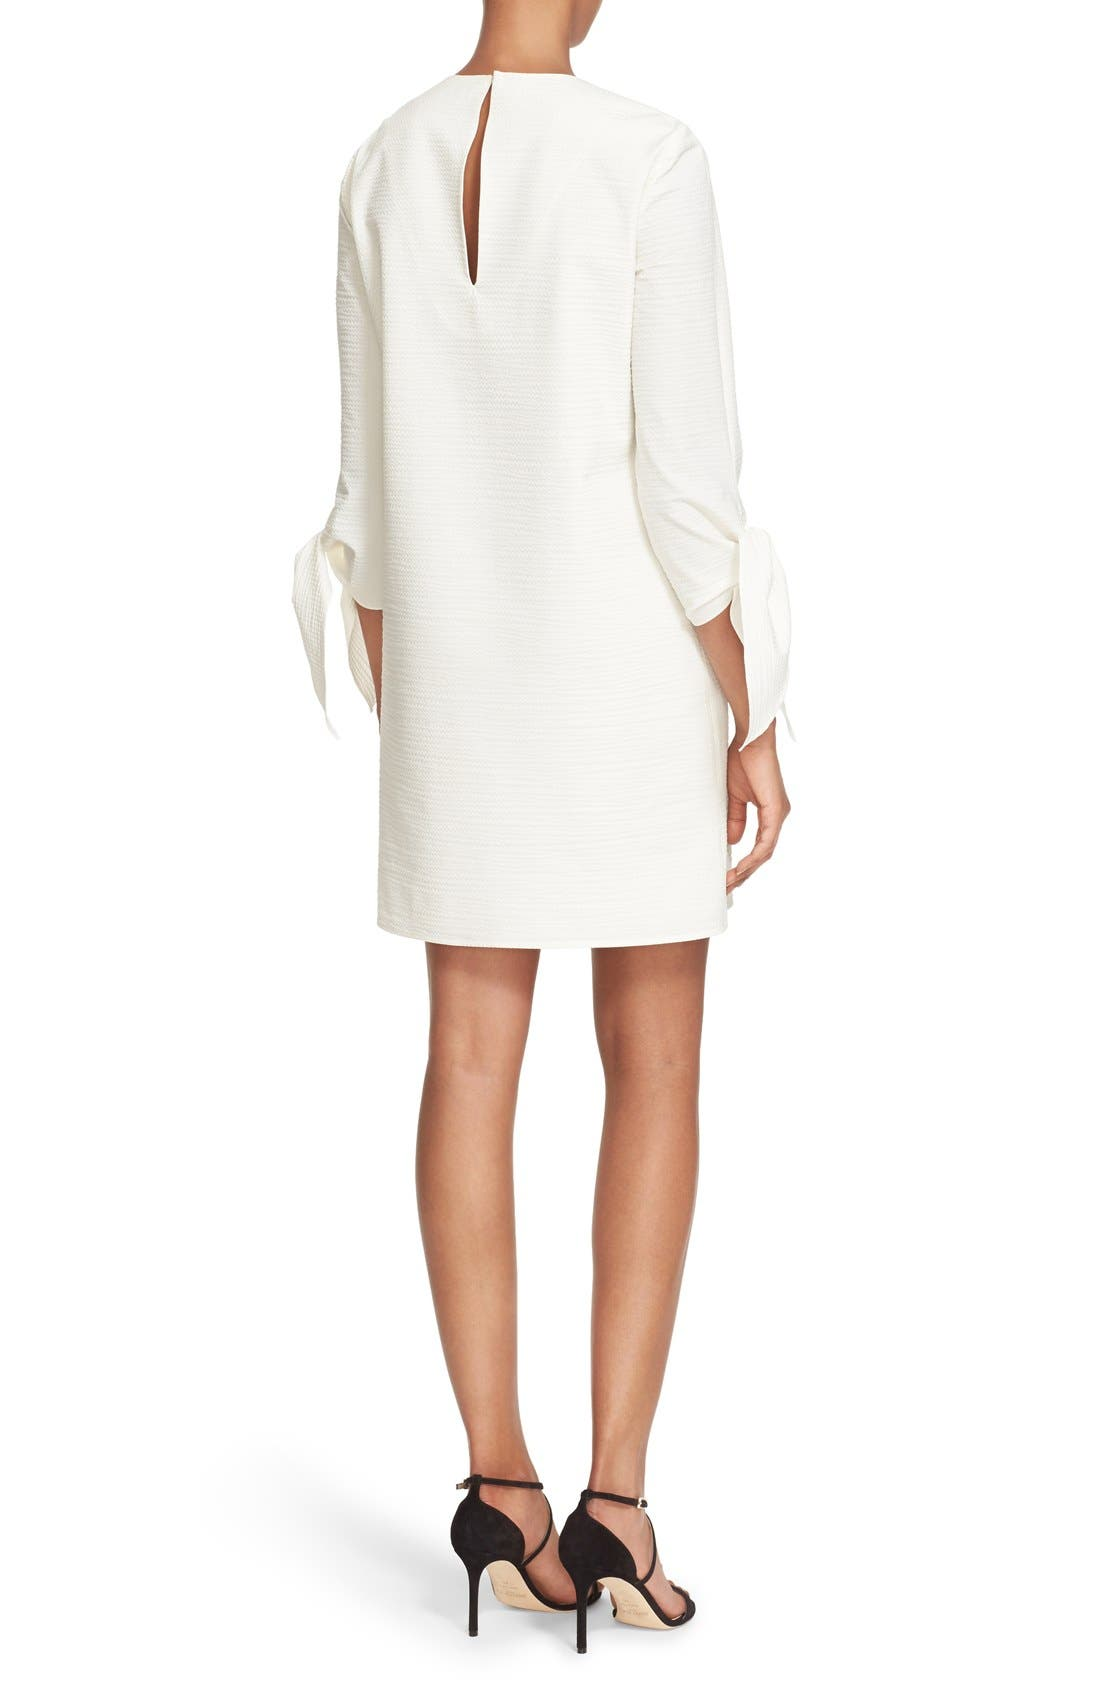 TIBI, Tie Sleeve Textured Cotton Blend Shift Dress, Alternate thumbnail 4, color, 100